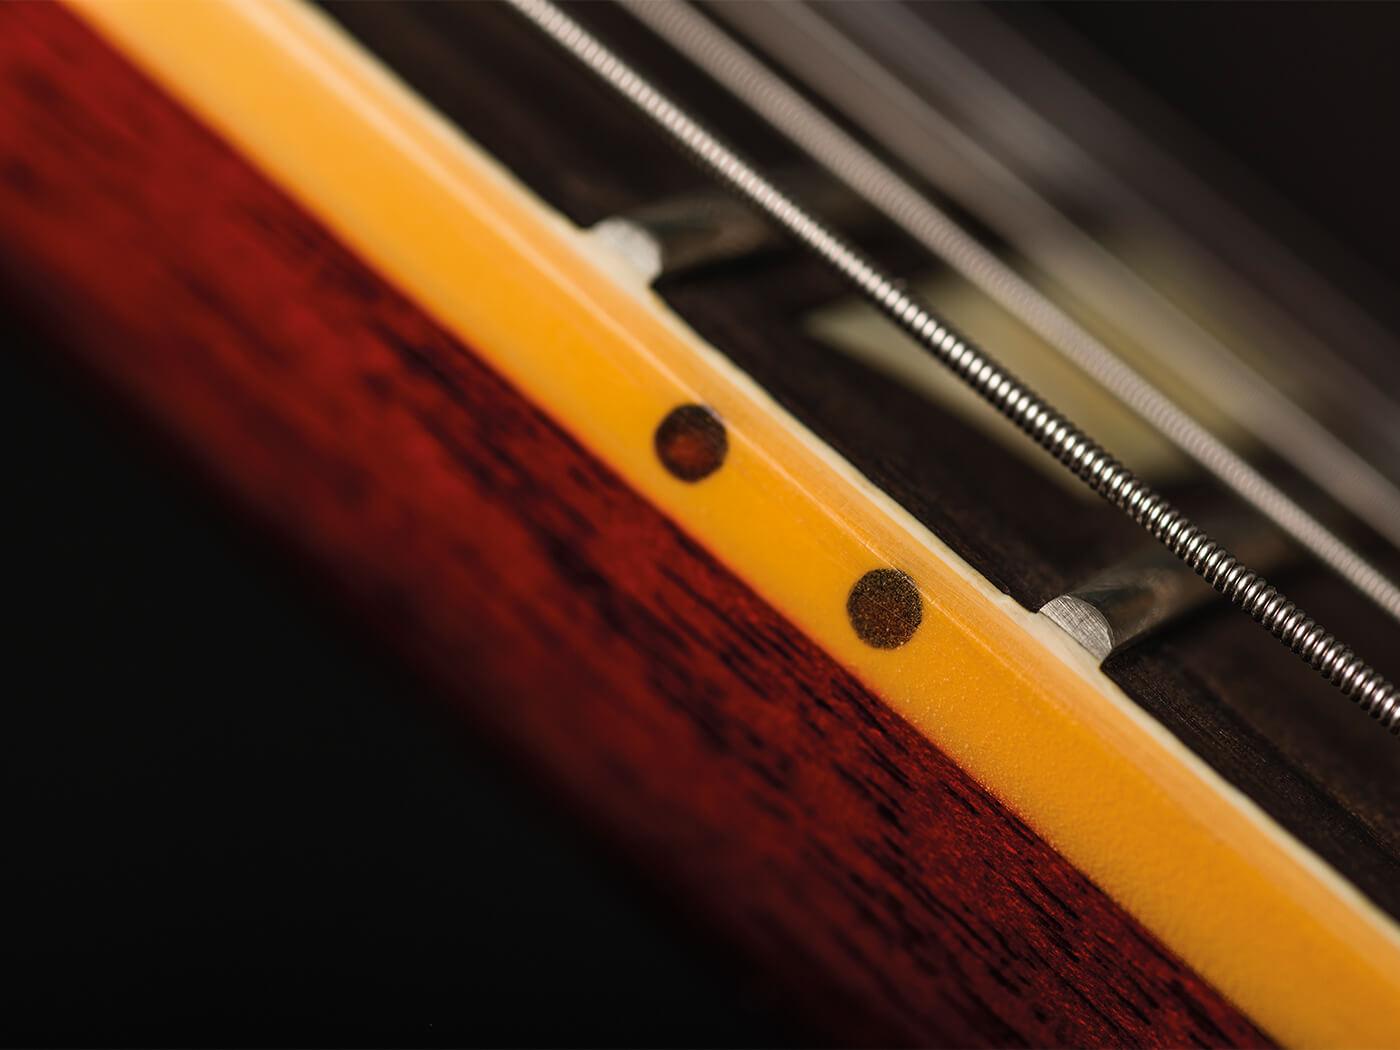 Gibson Custom 60th Anniversary 1959 Les Paul Standard fretboard markers